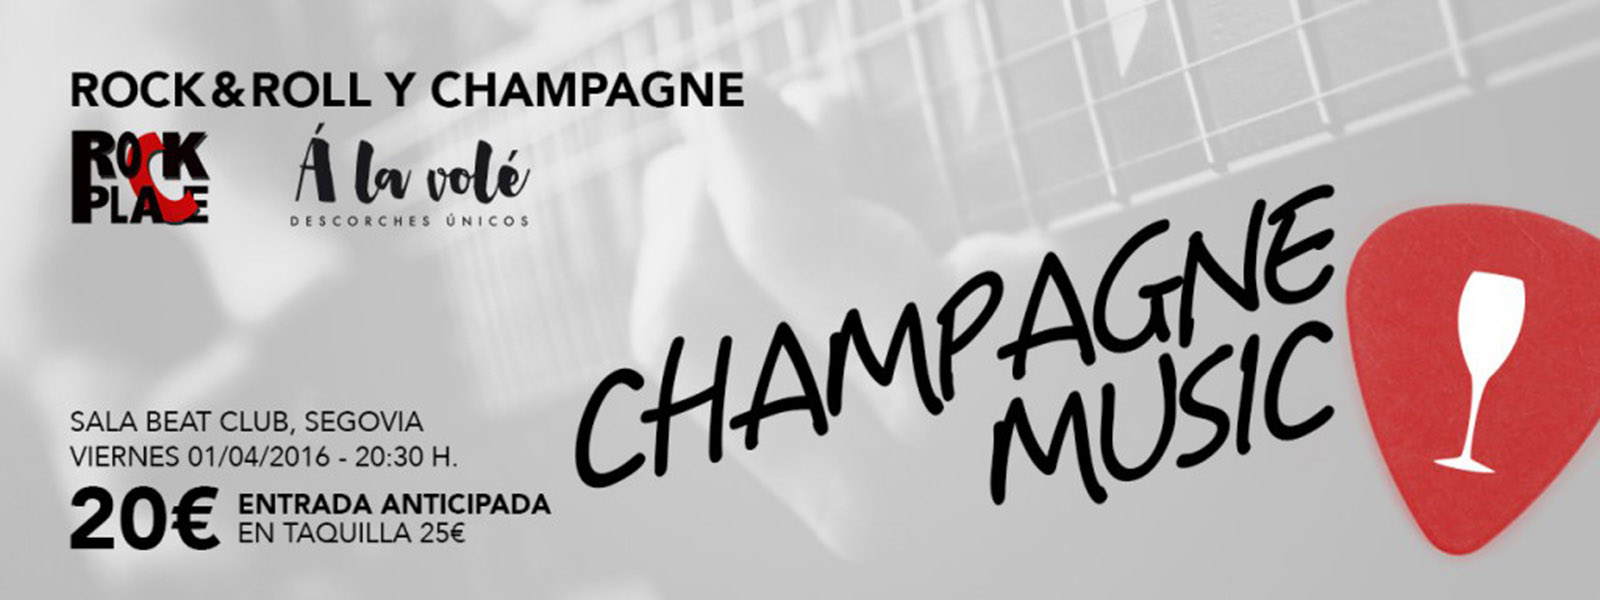 champagne-music-2016 (1)